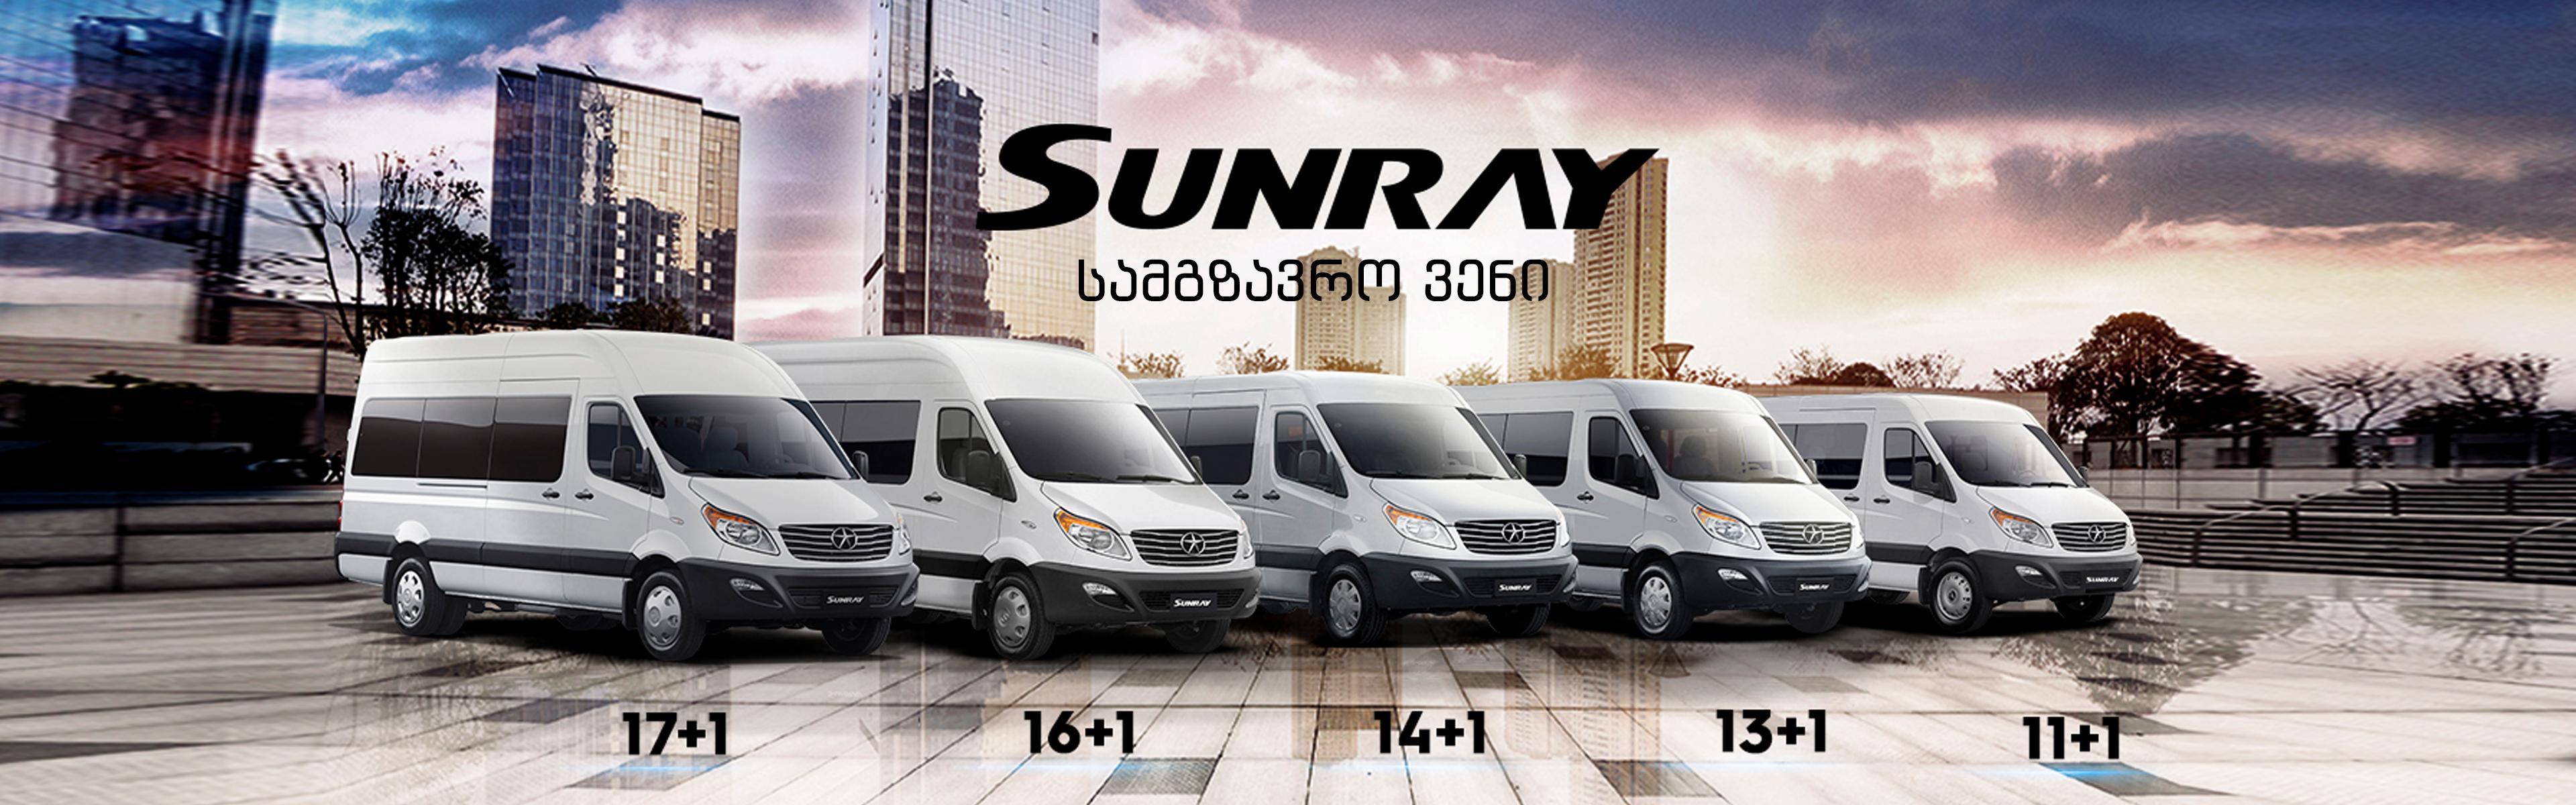 SUNRAY – Van